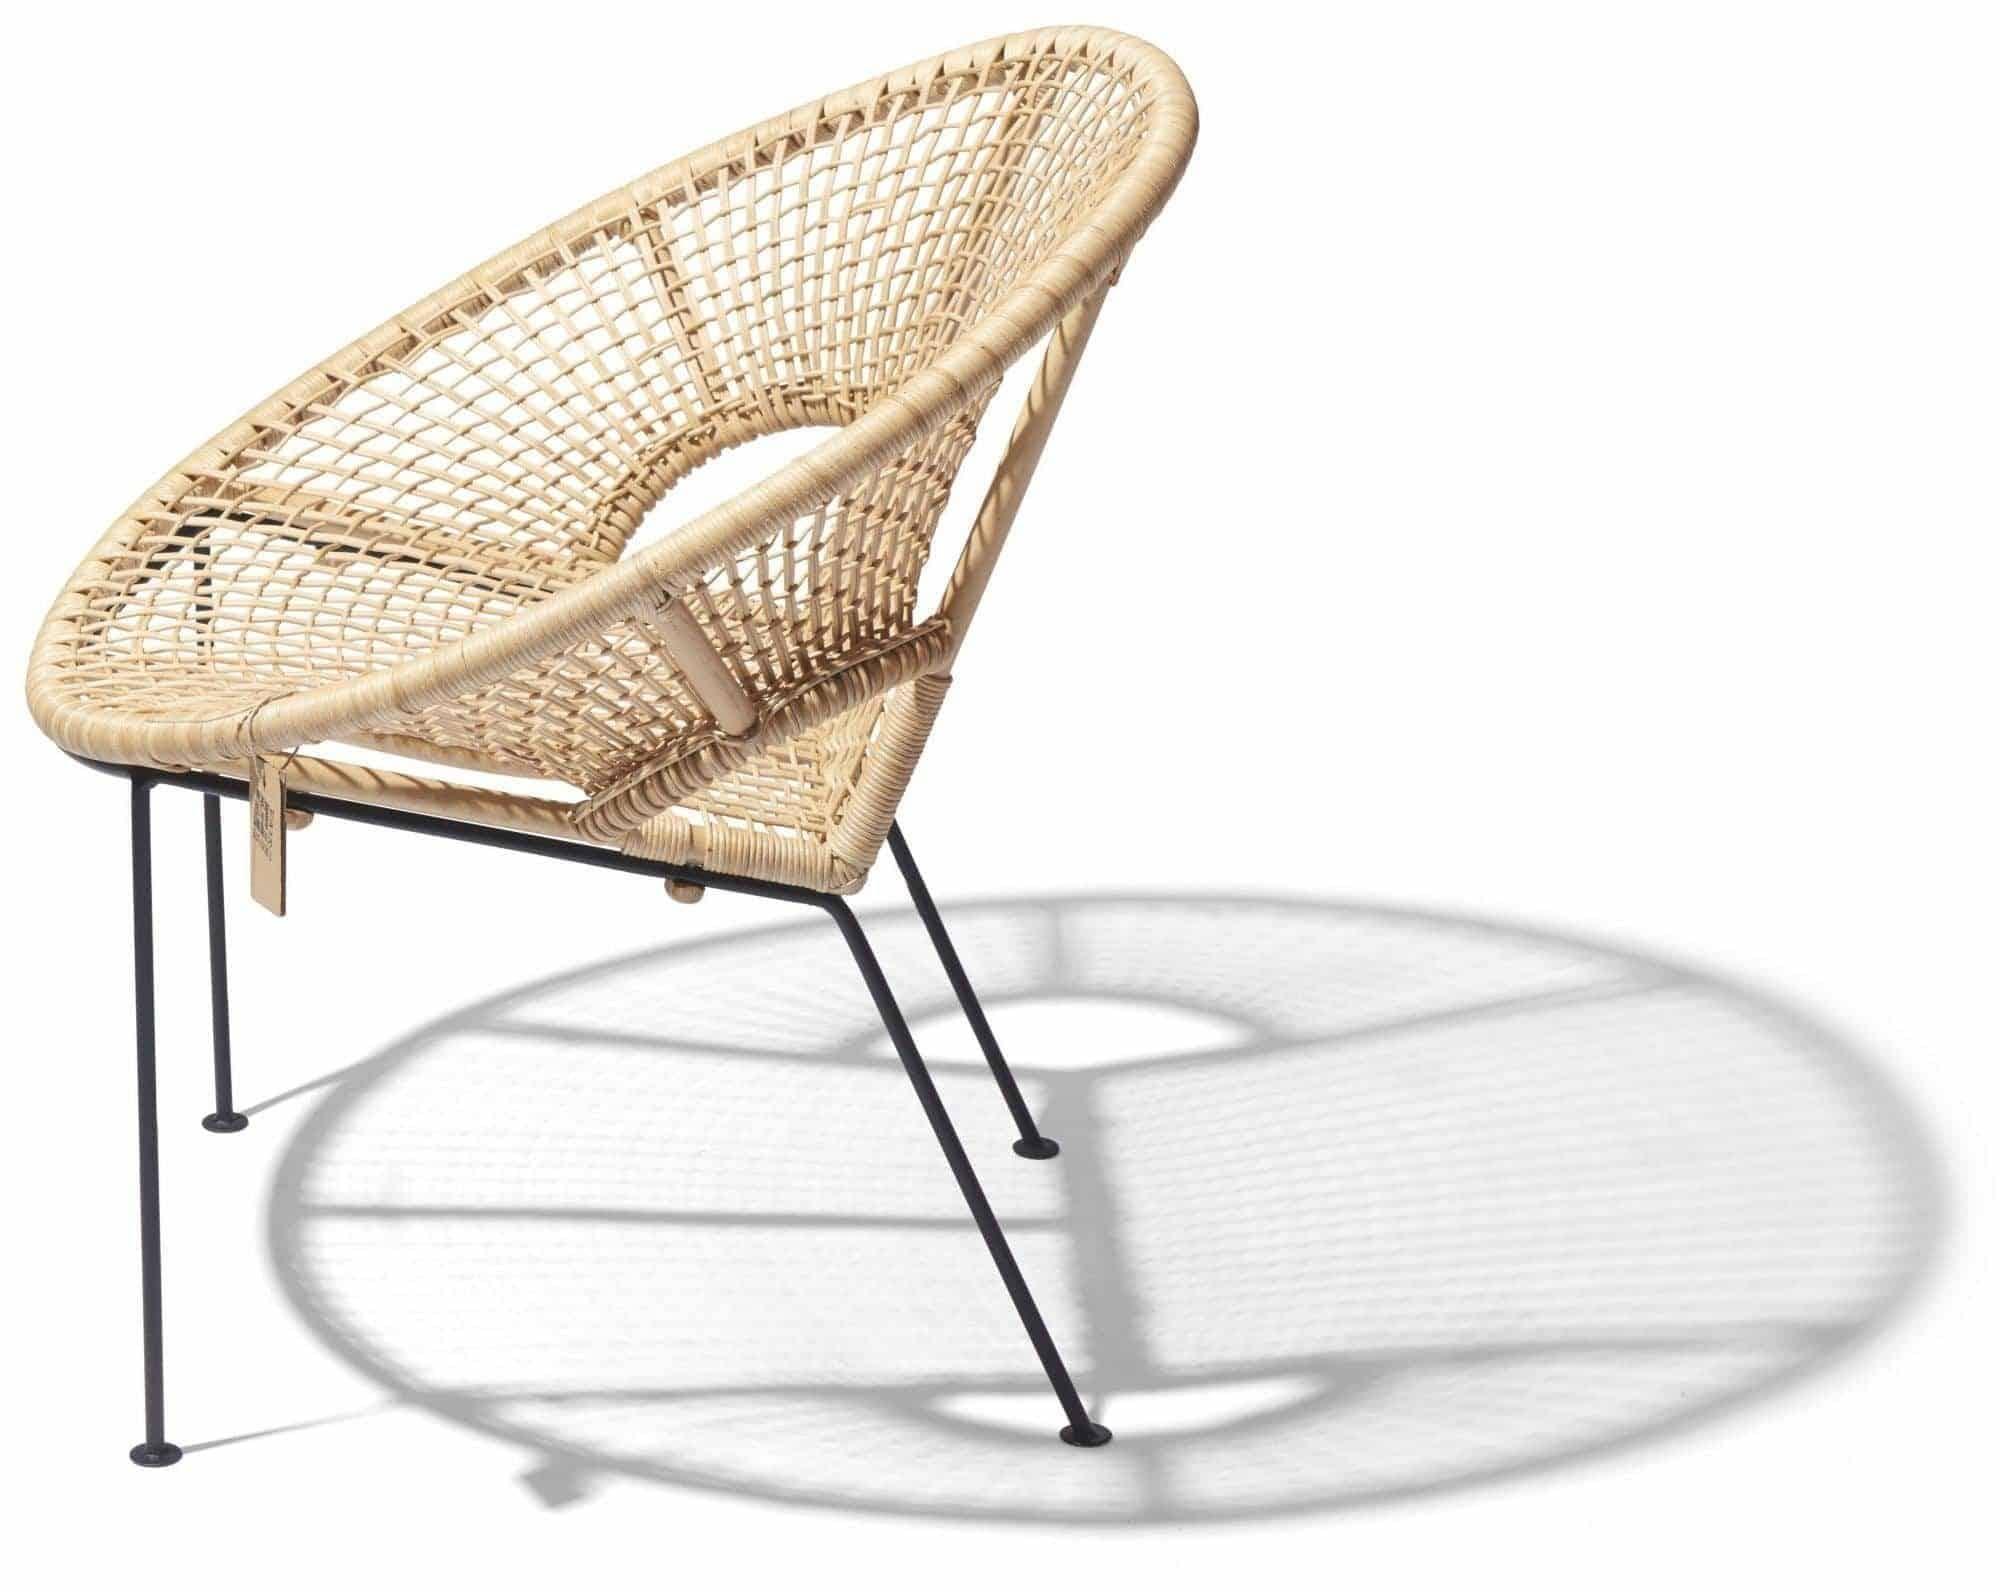 ubud-chair-side-view-fairfurniture